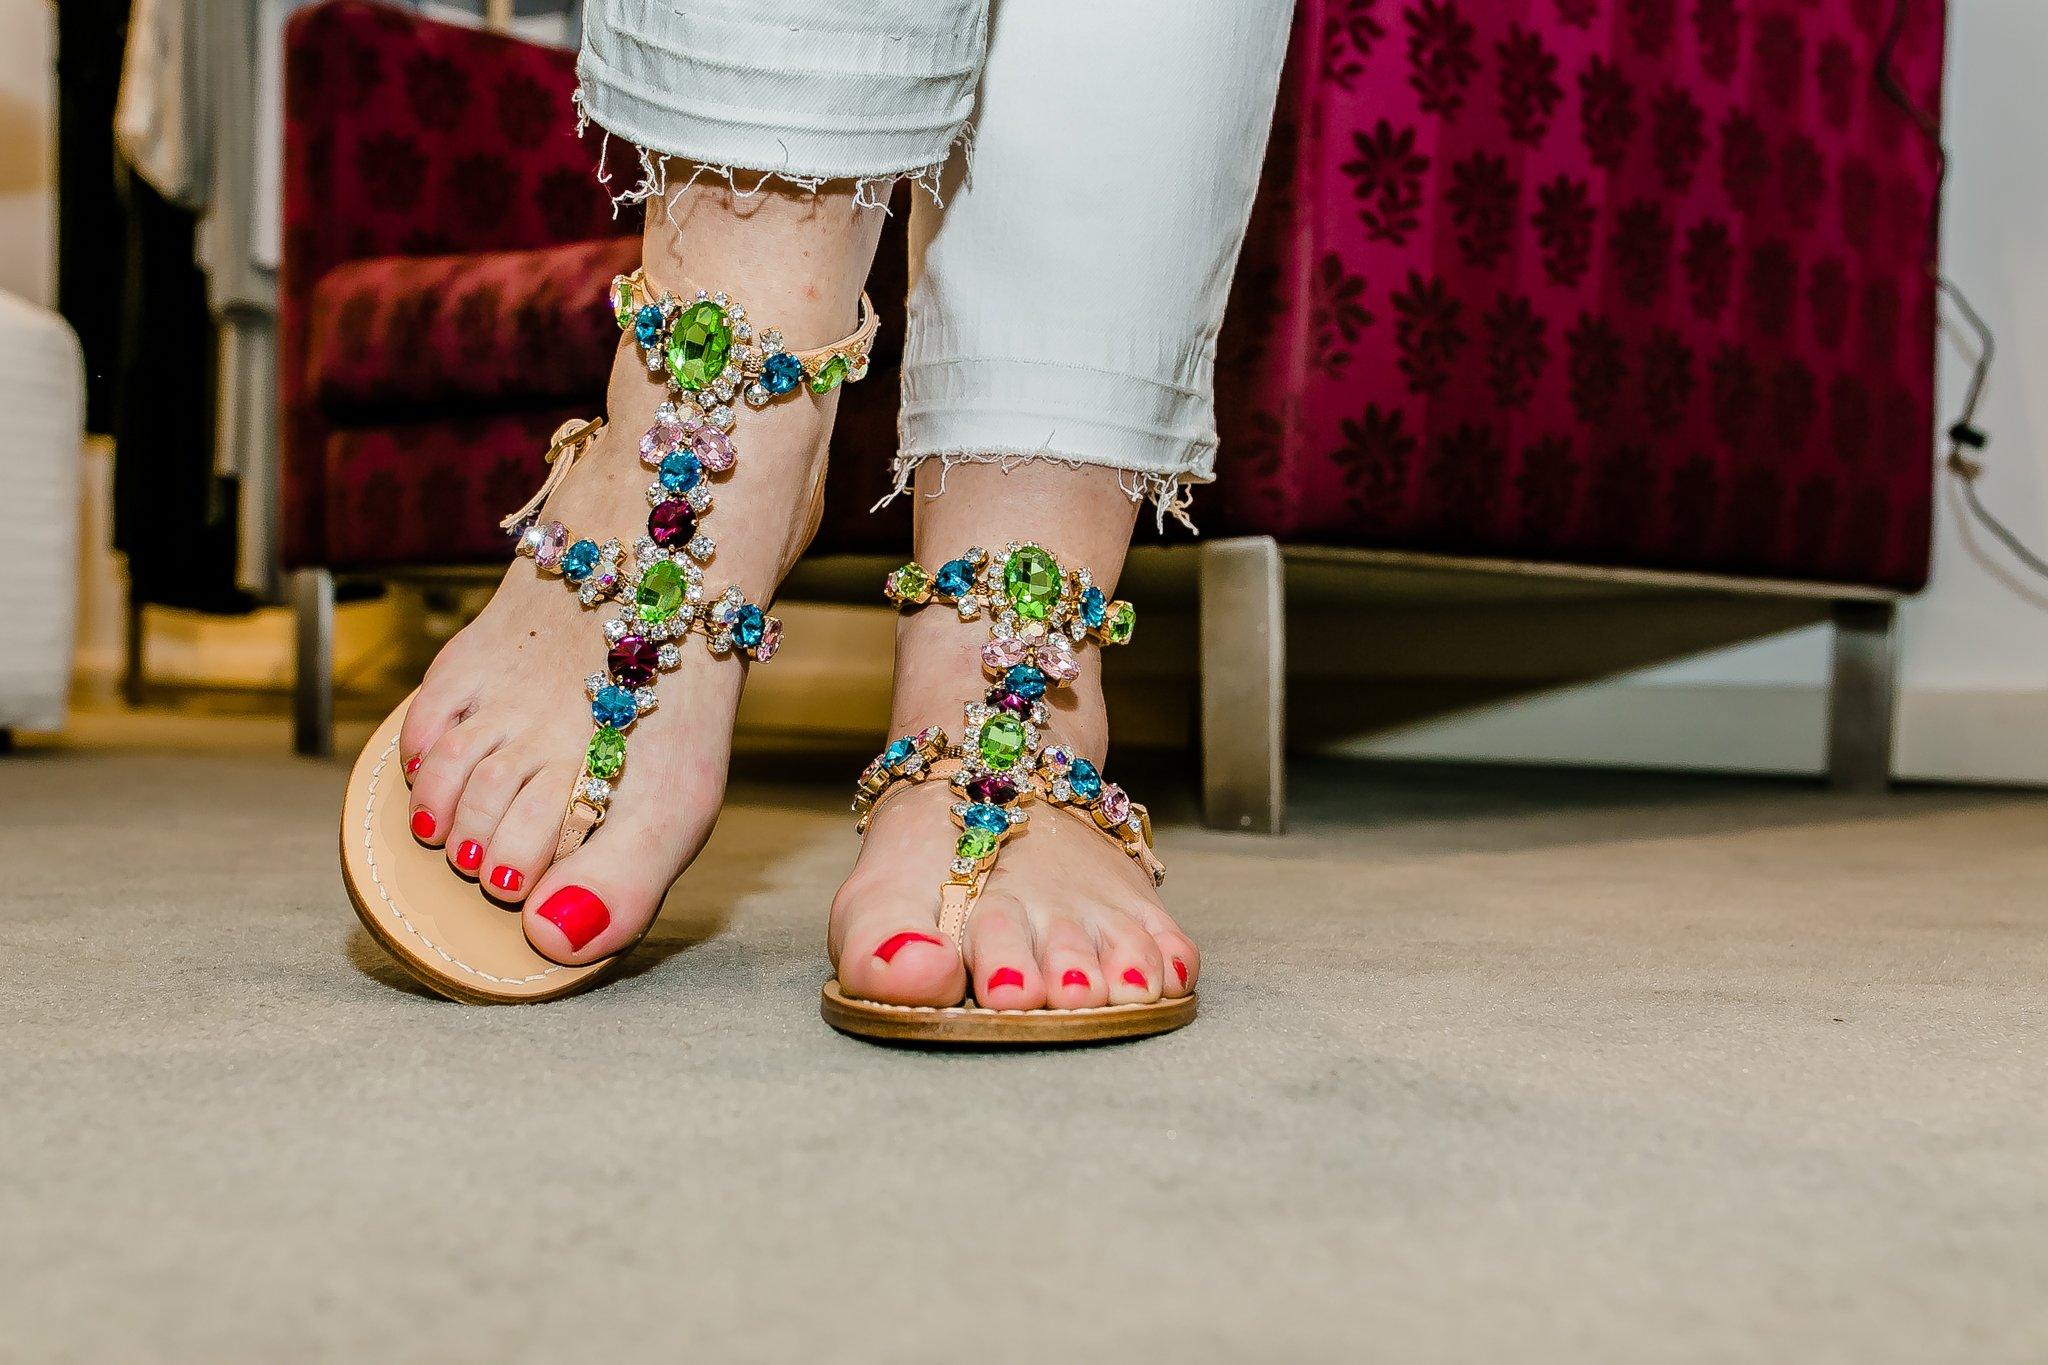 I Sandali Capresi di Preludio  gioielli da calzare 32a6fbc2eae